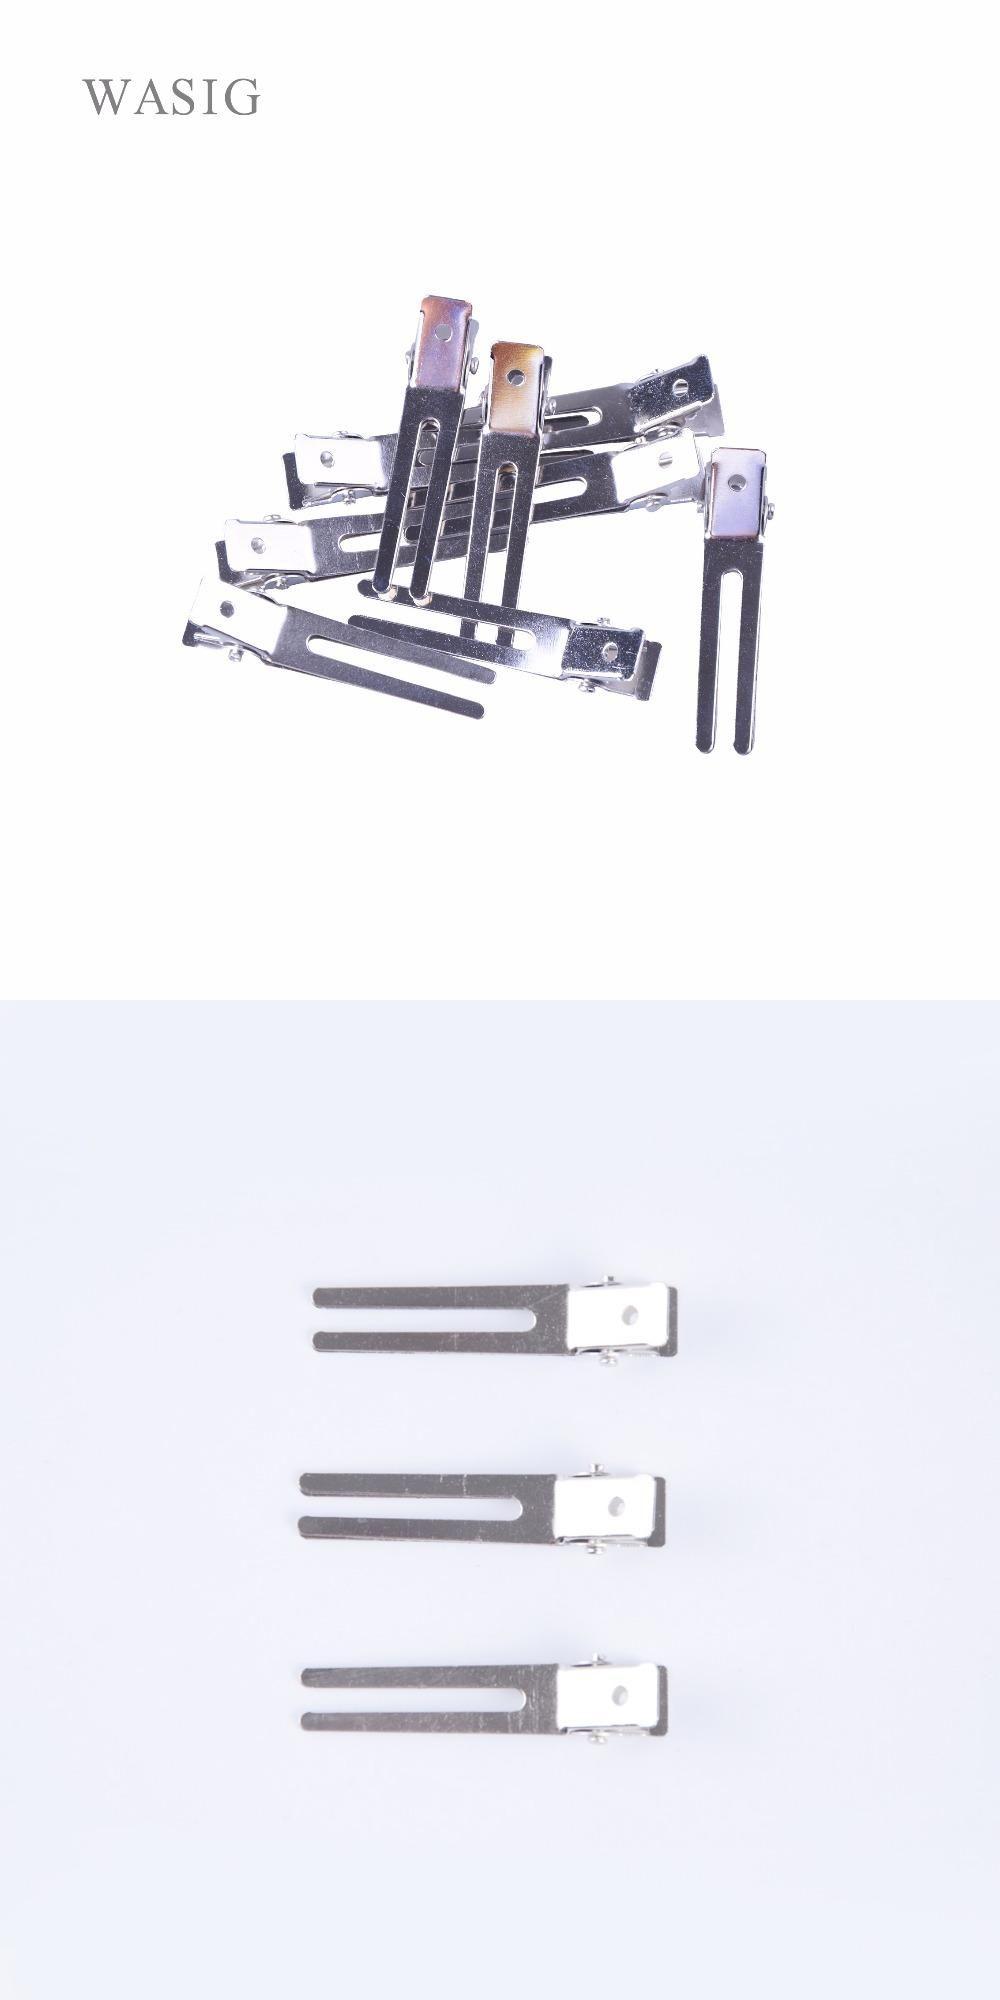 100pcs 45mm double prong alligator hair clips flat metal boutique